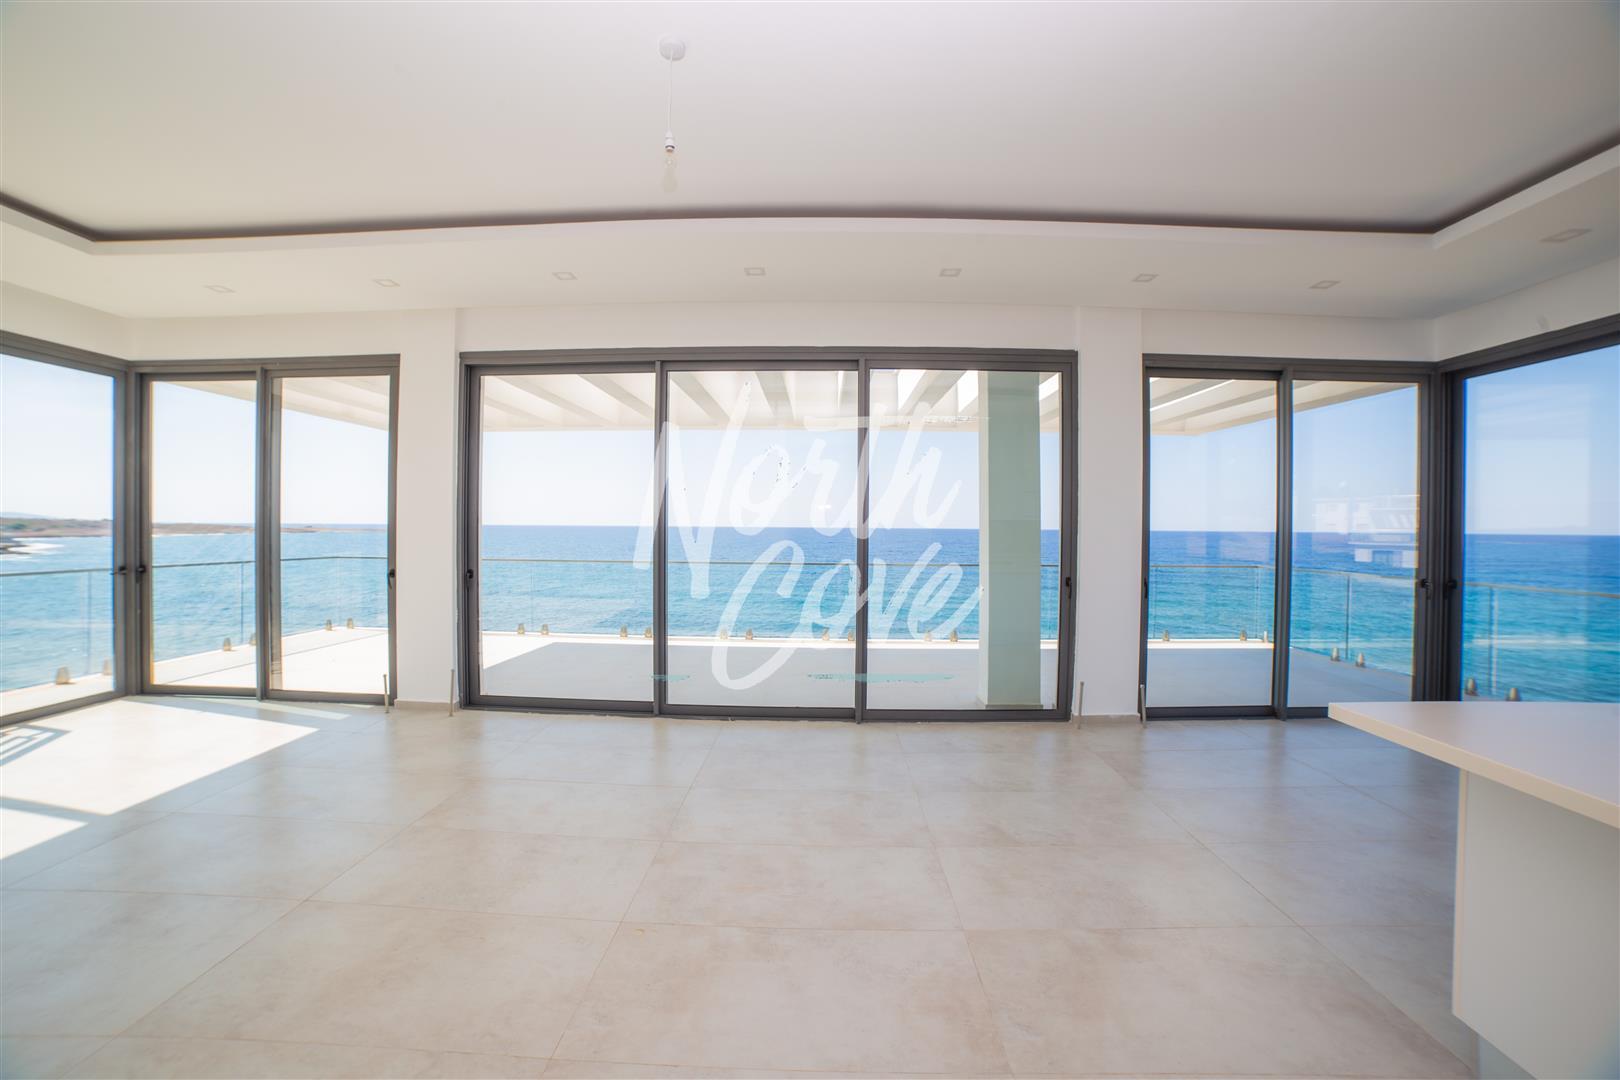 Contemporary 5 bedroom beachfront residence